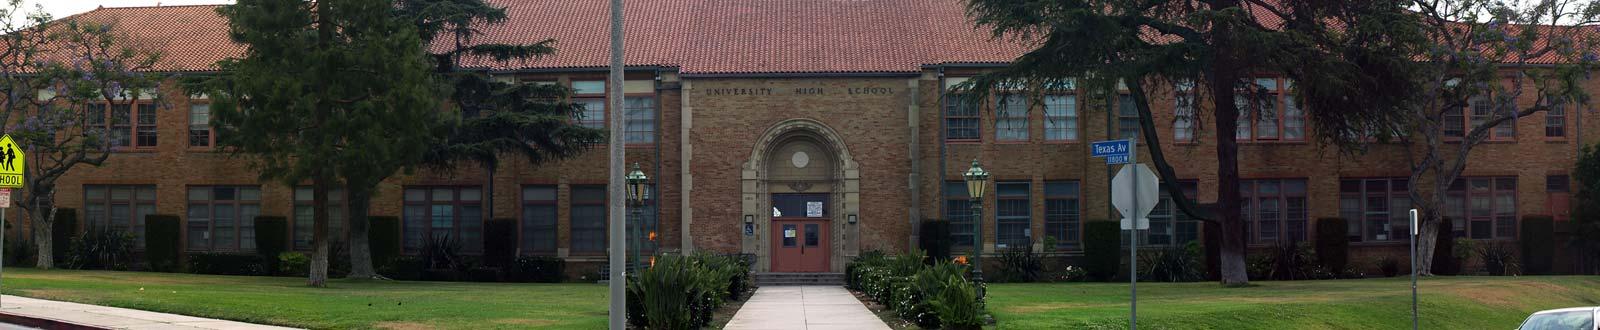 University High School in Los Angeles